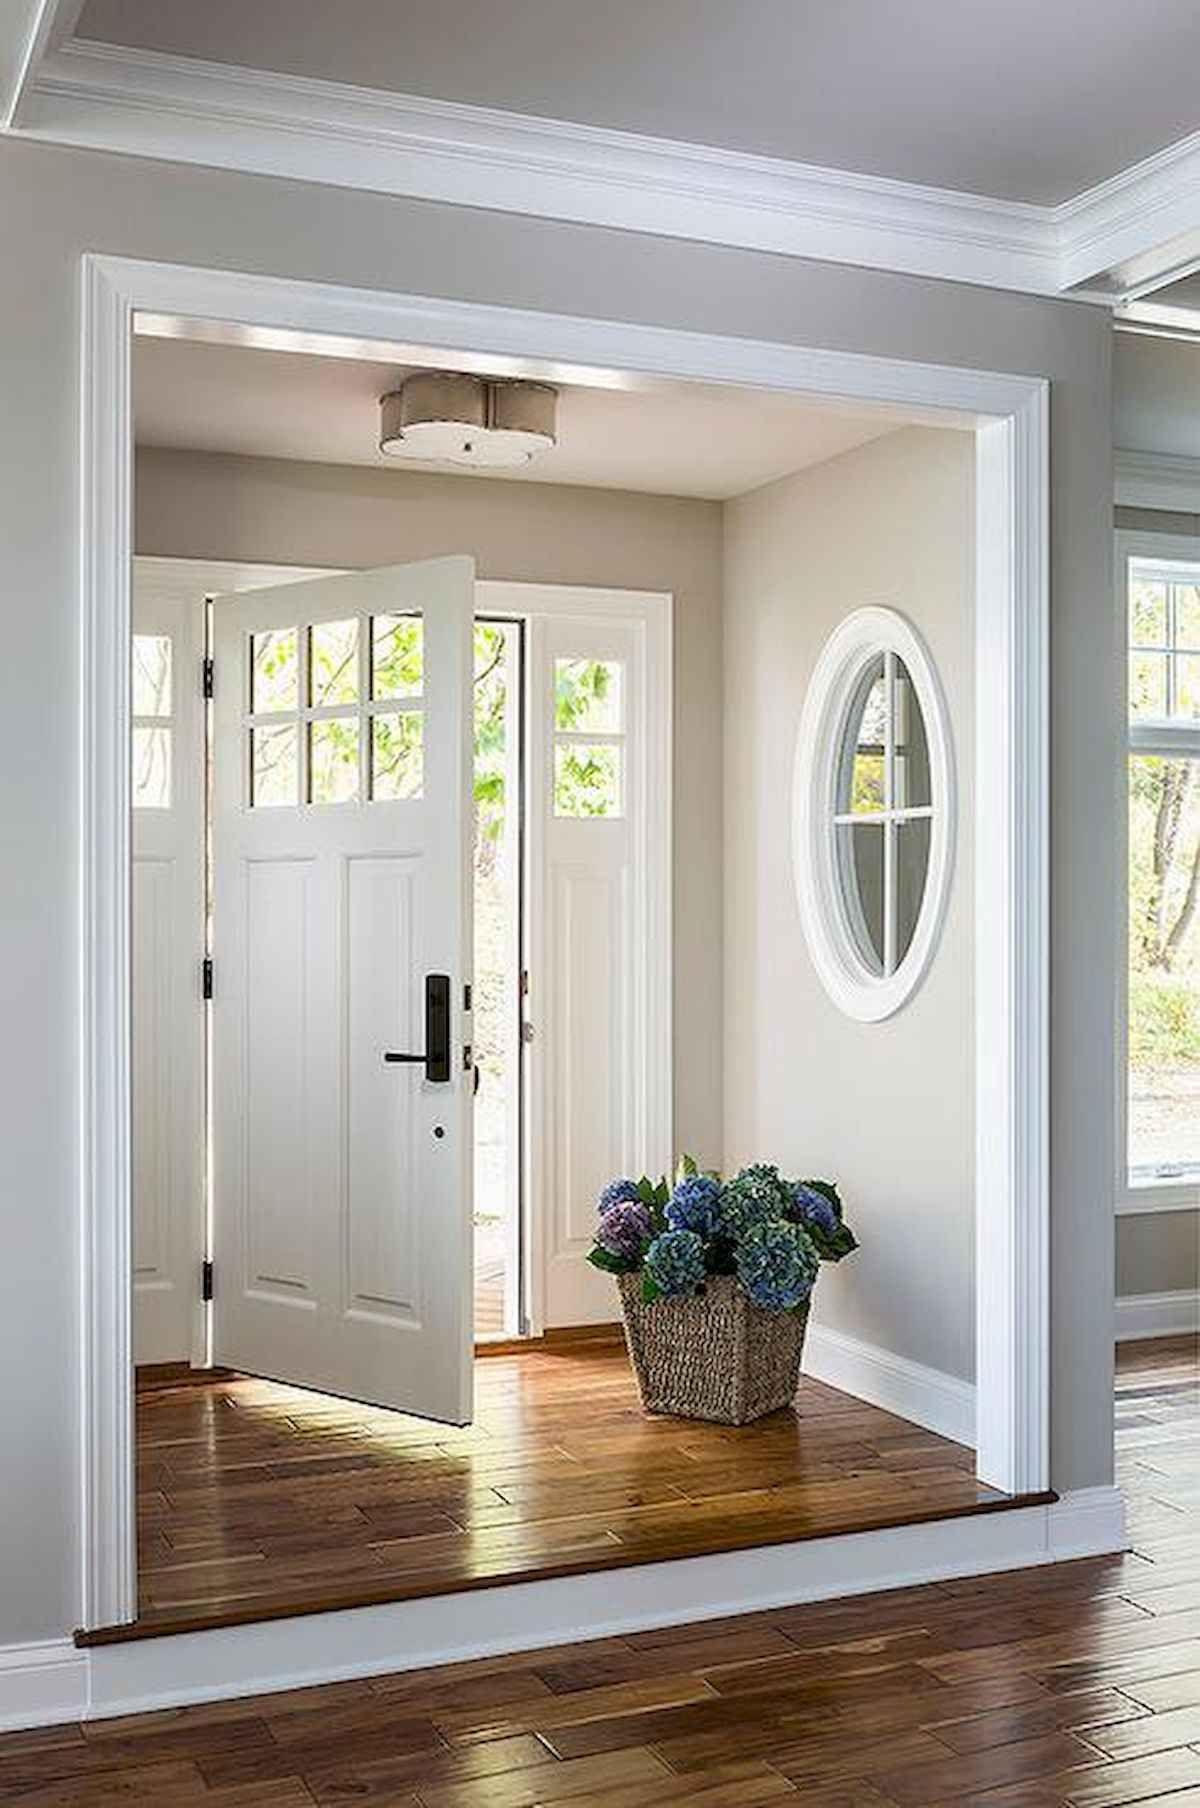 100 Unique Front Doors Colors Design Ideas 47 Interior Windows New Homes Home